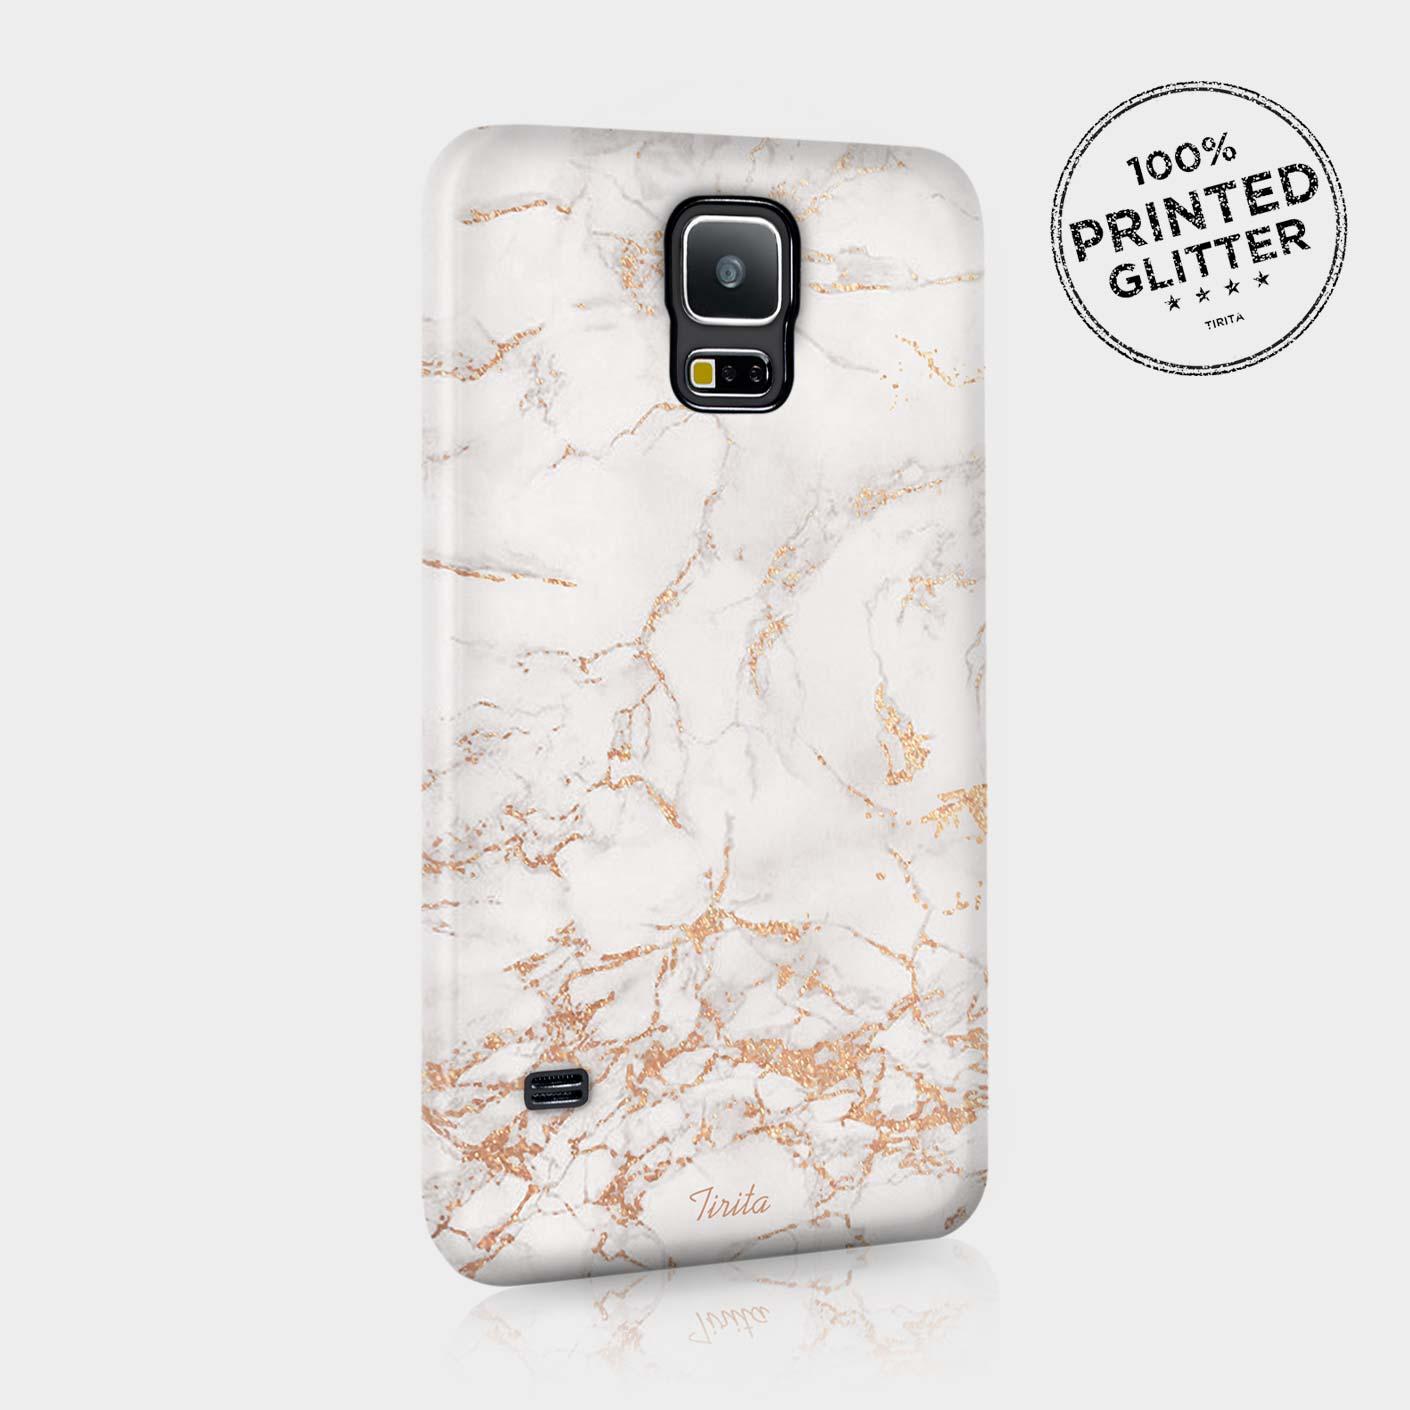 tirita rose gold marble glitter cute phone case hard cover for samsung